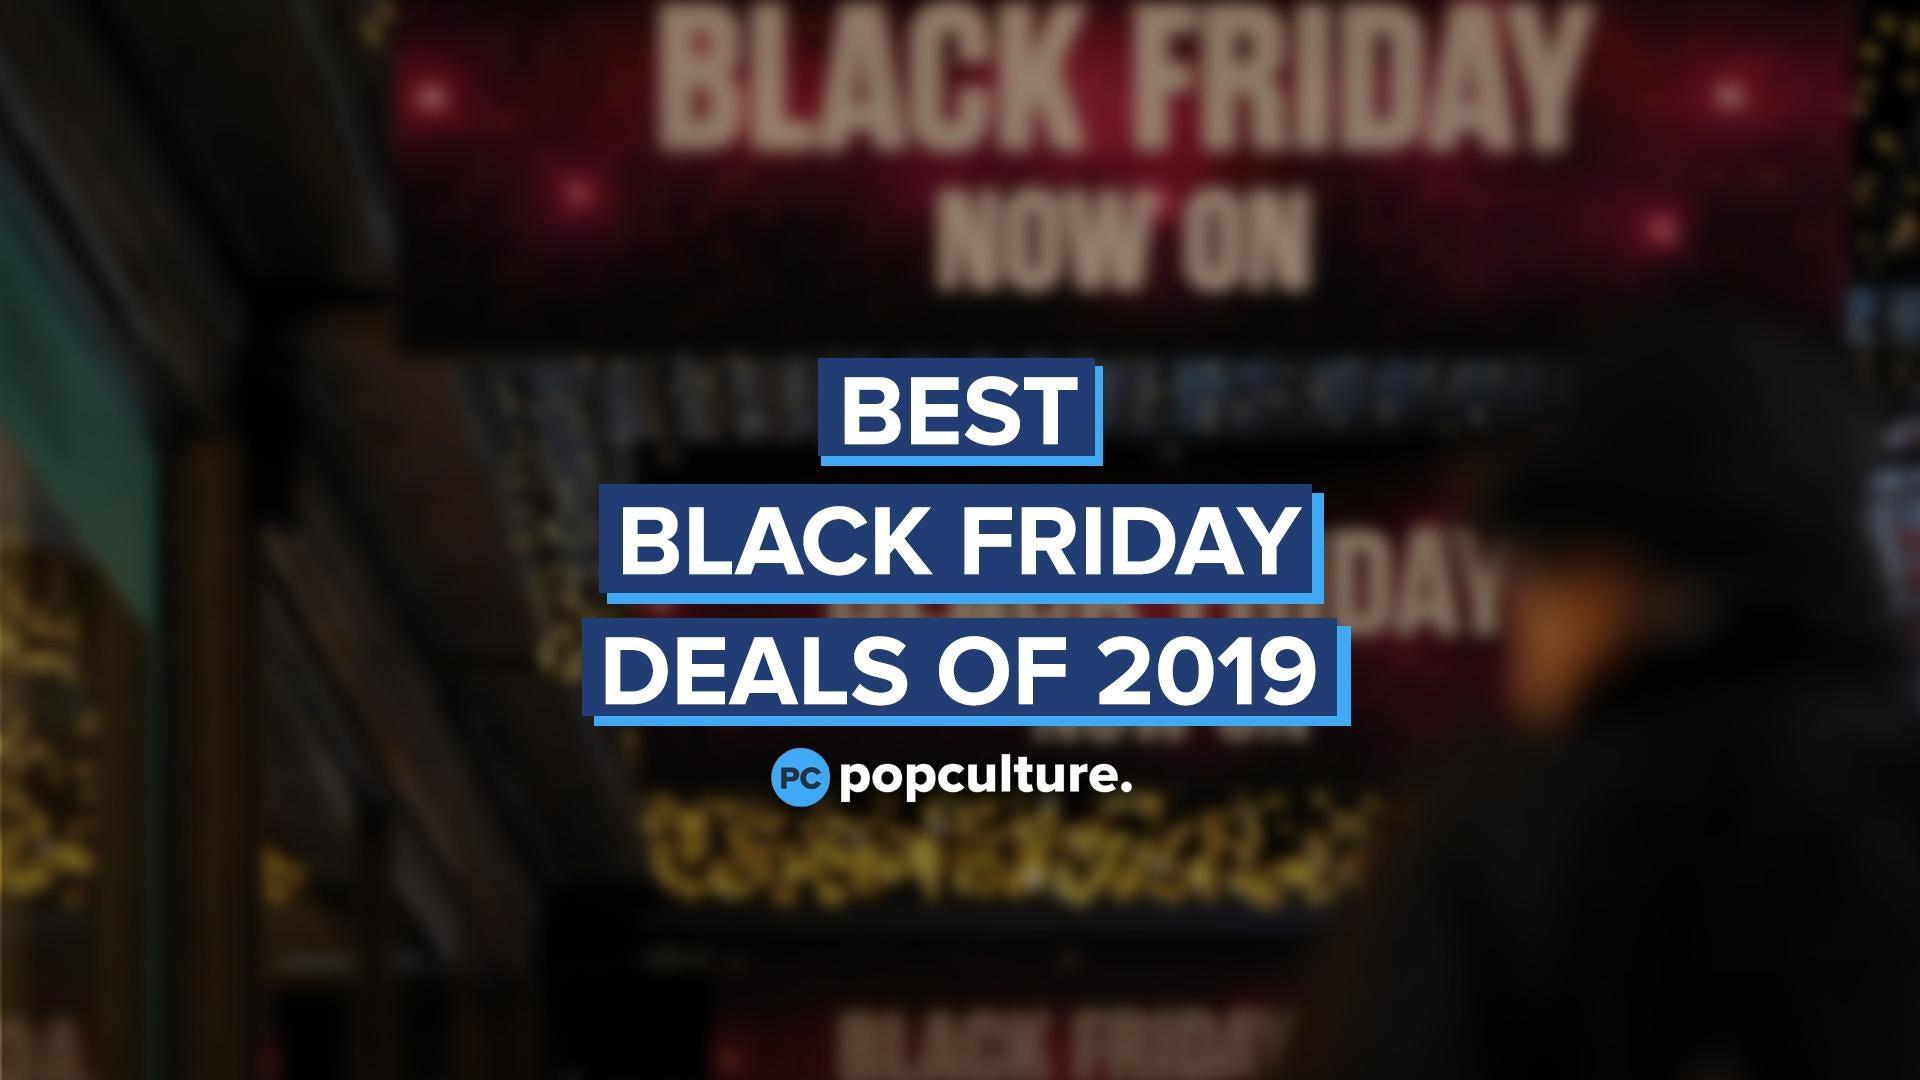 Best Black Friday Deals of 2019 screen capture